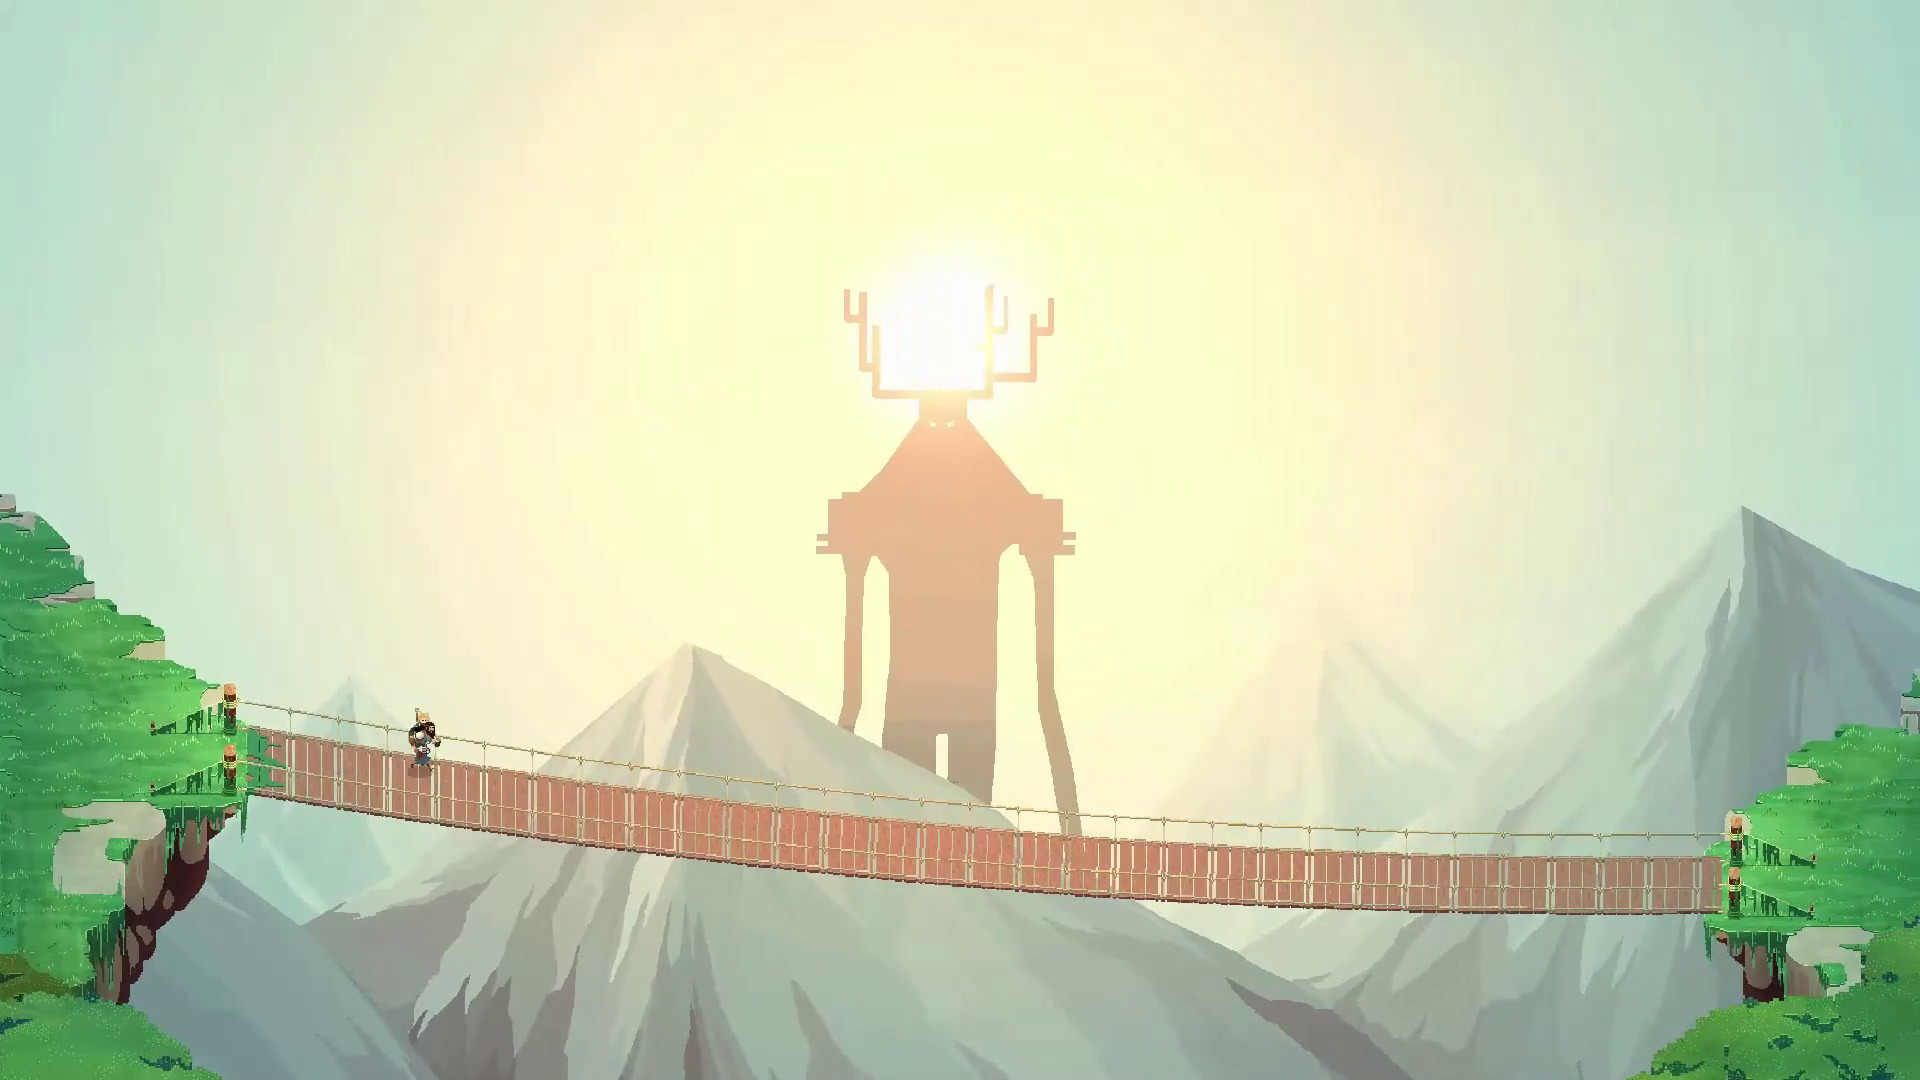 No Place for Bravery выйдет на Nintendo Switch и в Steam в конце года